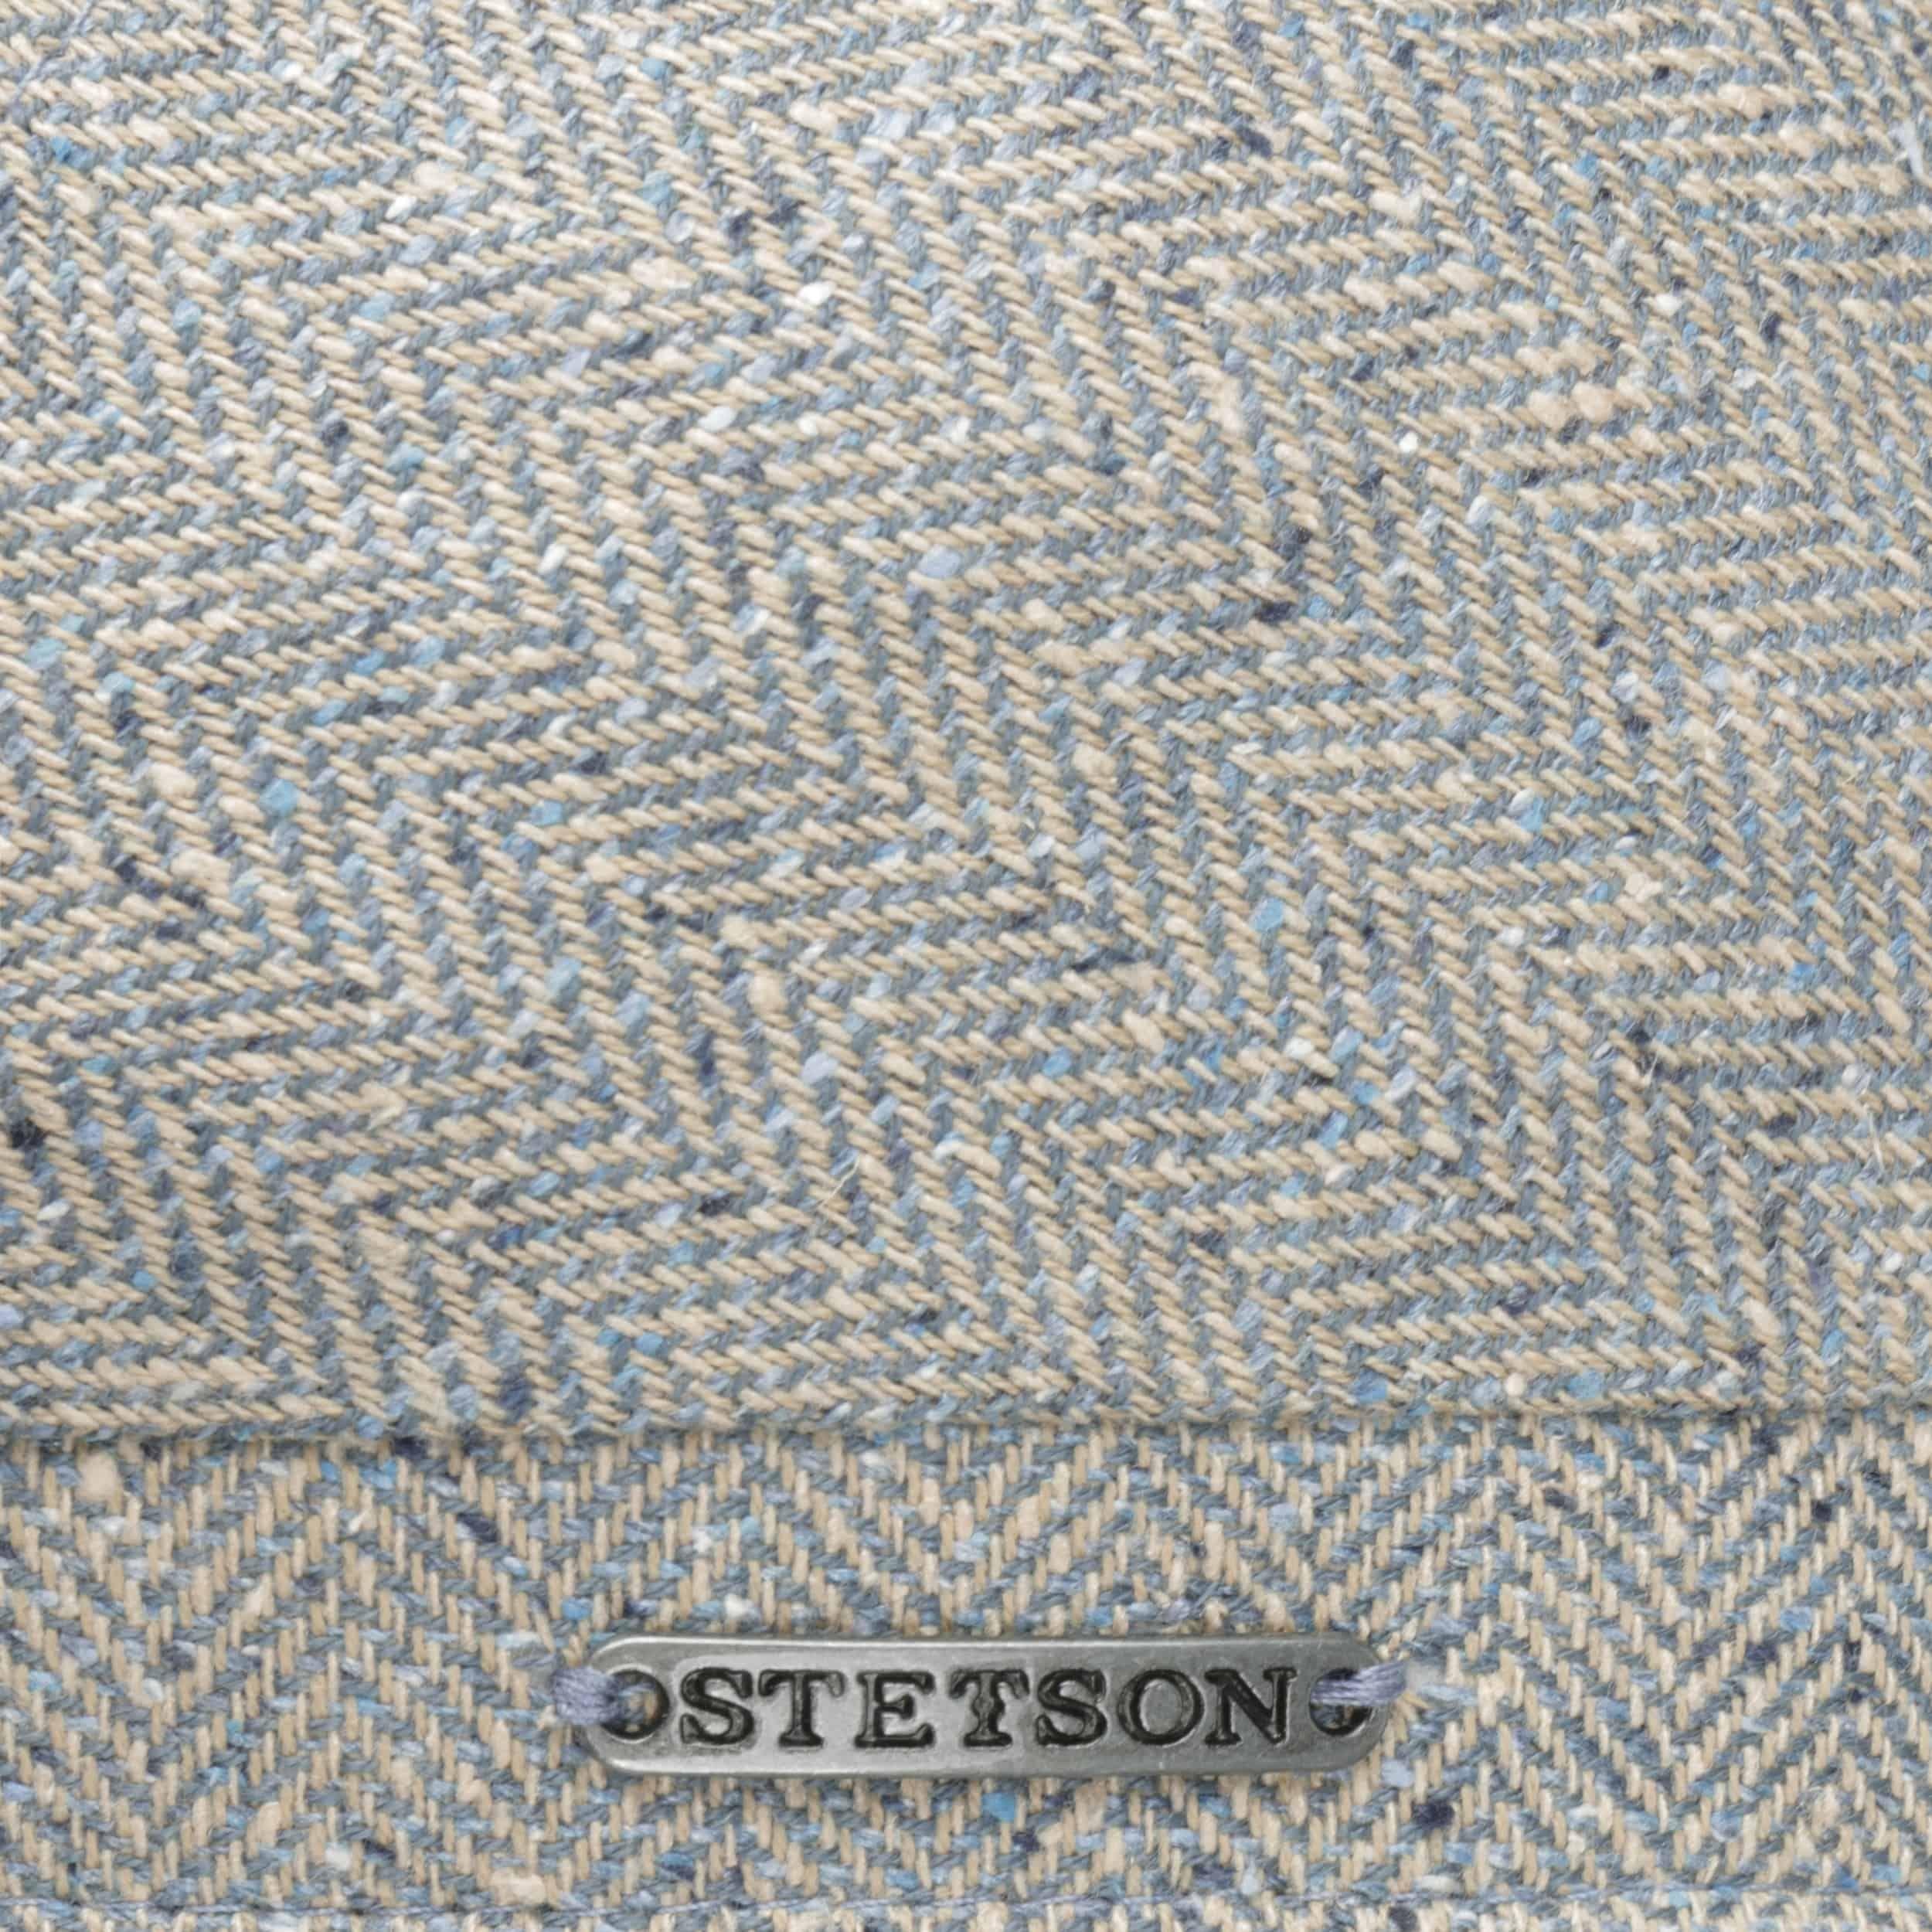 Hayton Herringbone 6 Panel Flat Cap beige-blue